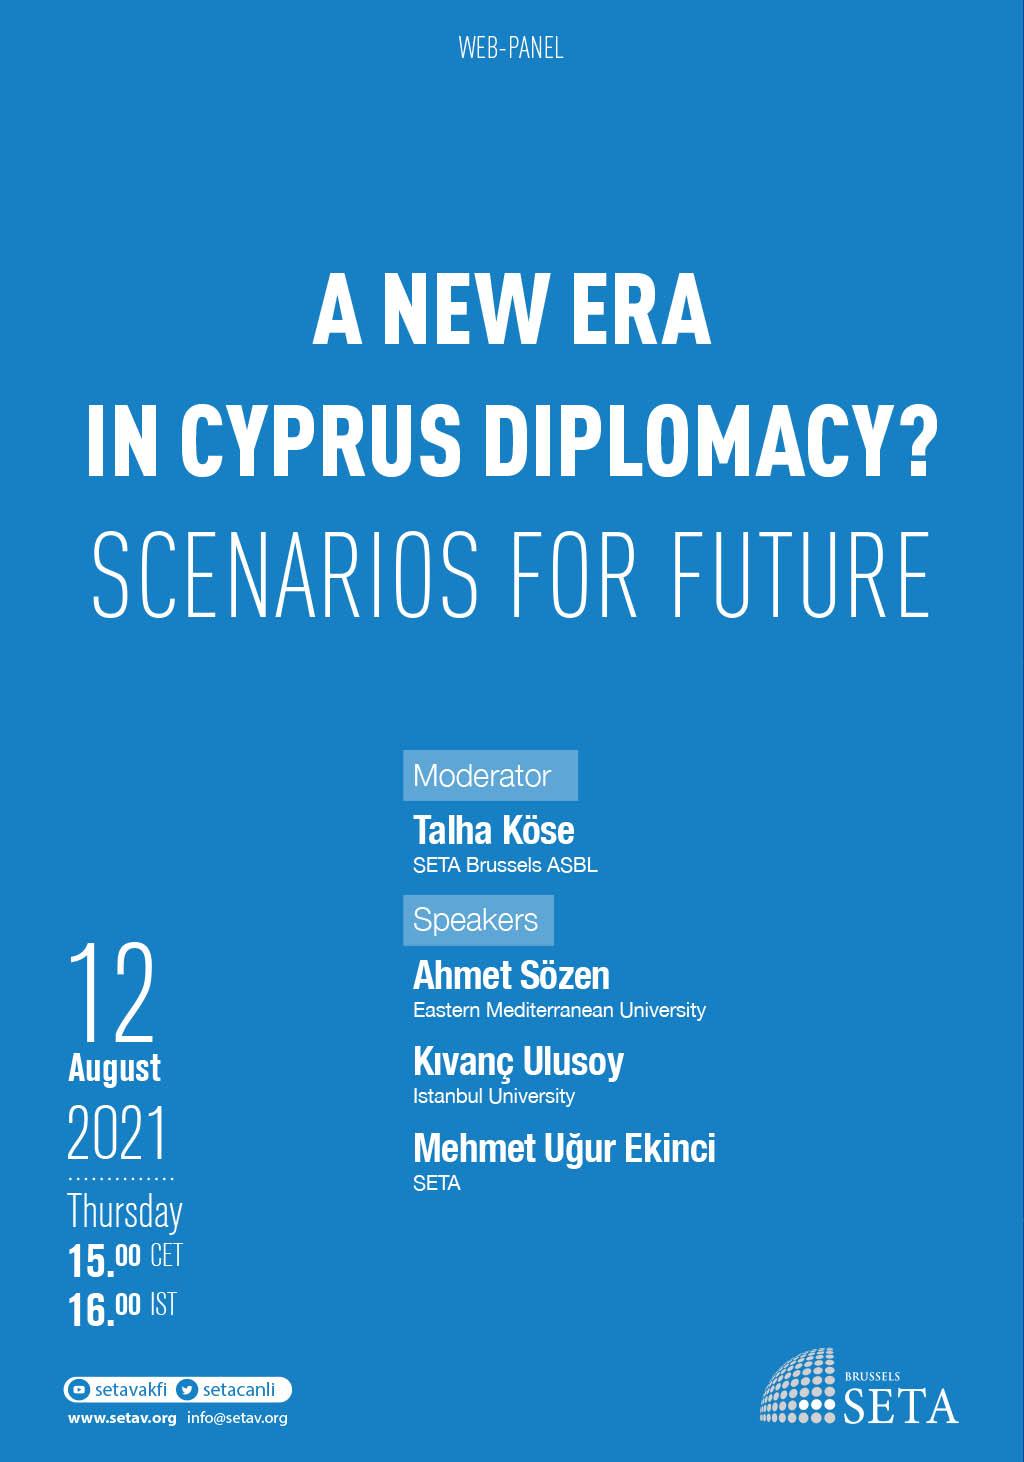 Web-Panel: A New Era in Cyprus Diplomacy? Scenarios for Future